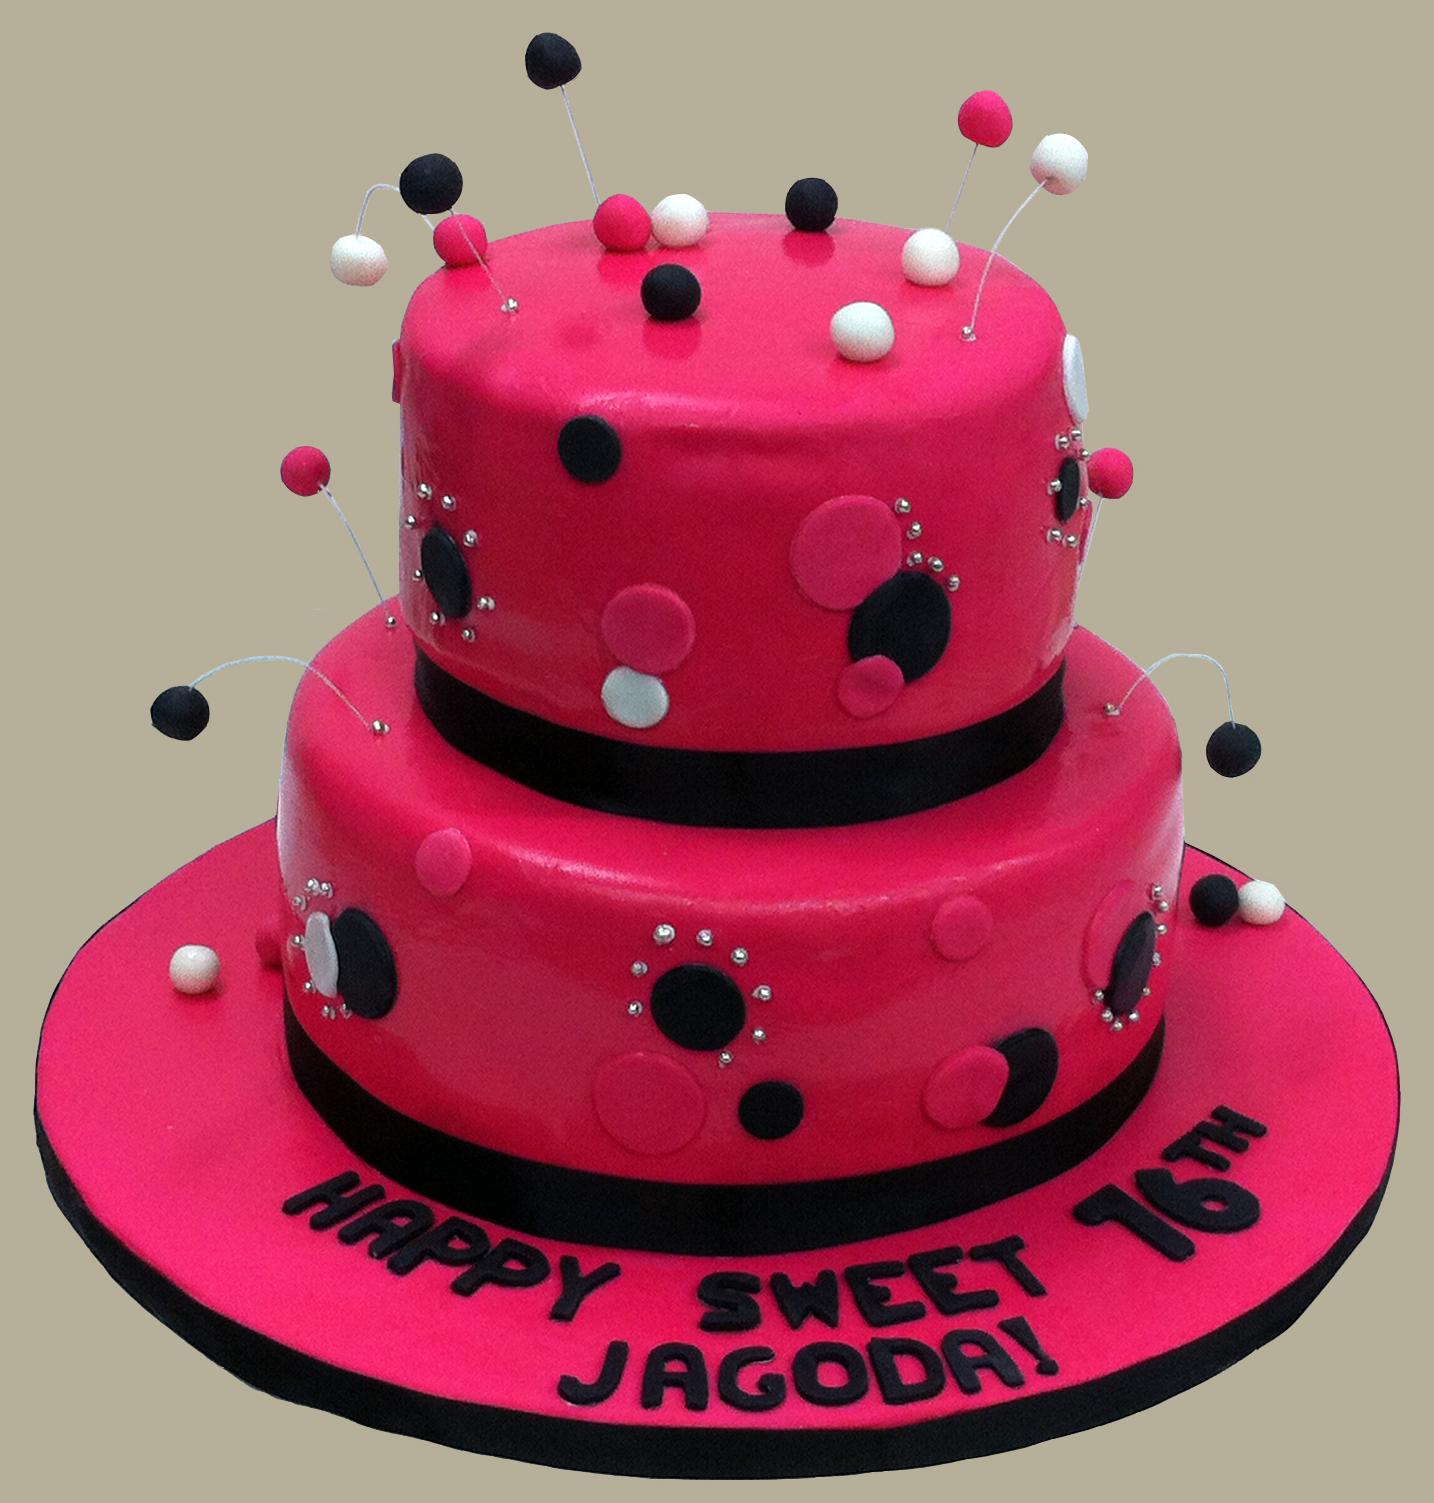 Birthday Cake Next Day Delivery